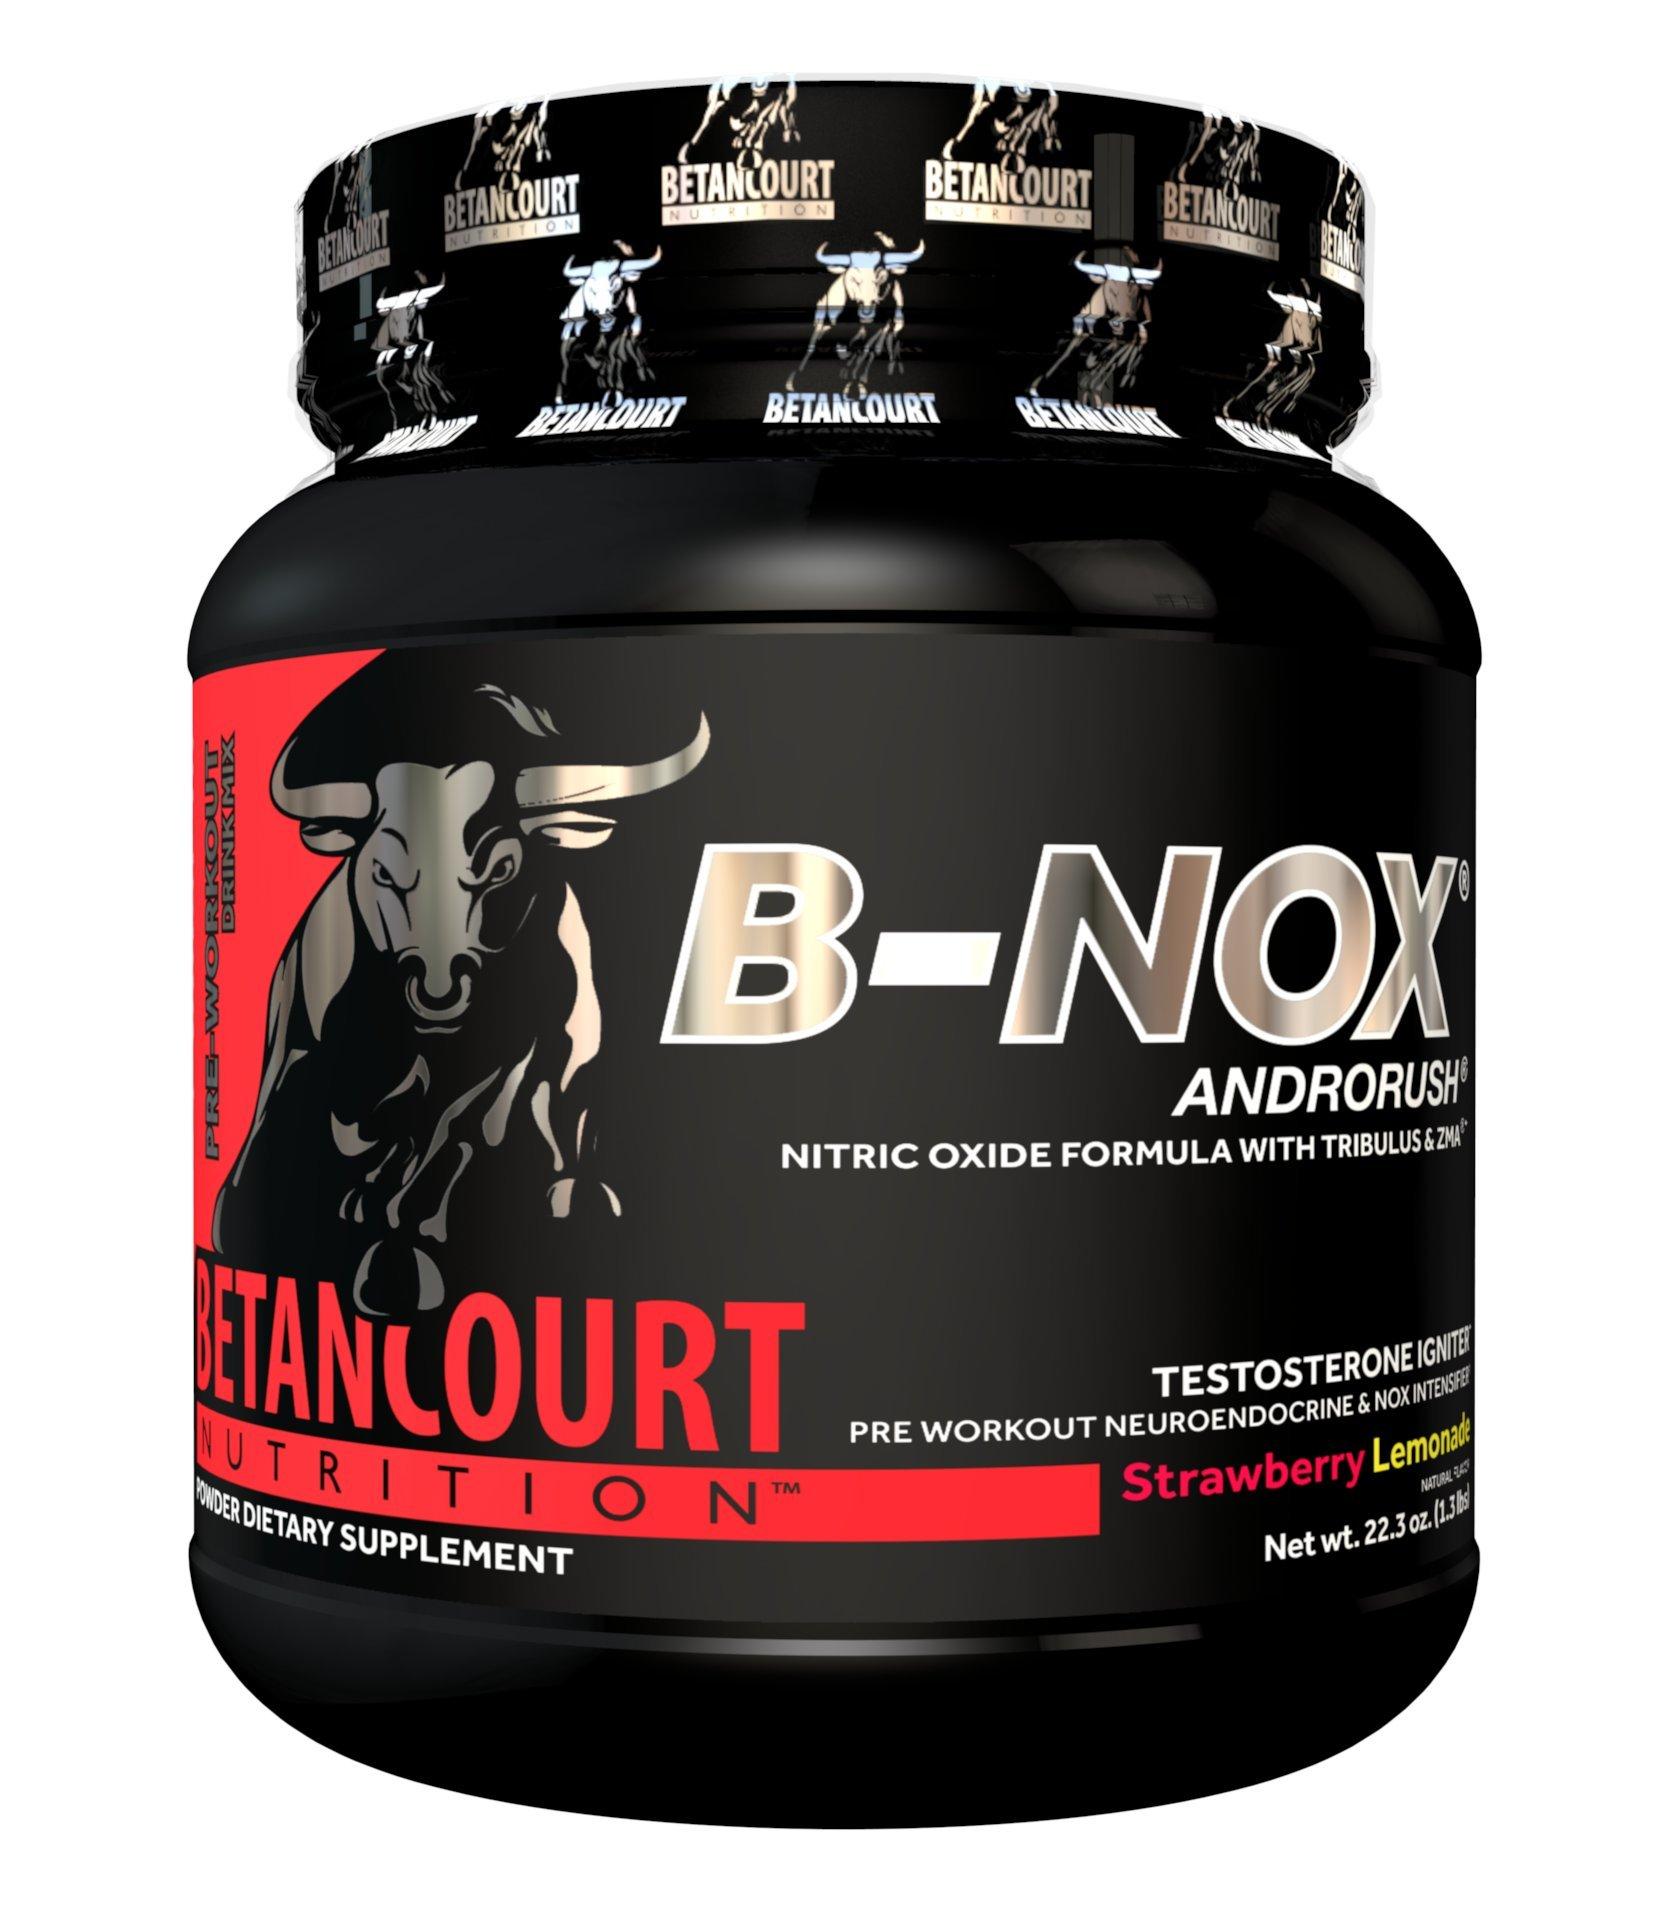 Betancourt Nutrition B-Nox Andorush Pre-Workout, Strawberry Lemonade, 22.3 Ounce by Betancourt Nutrition